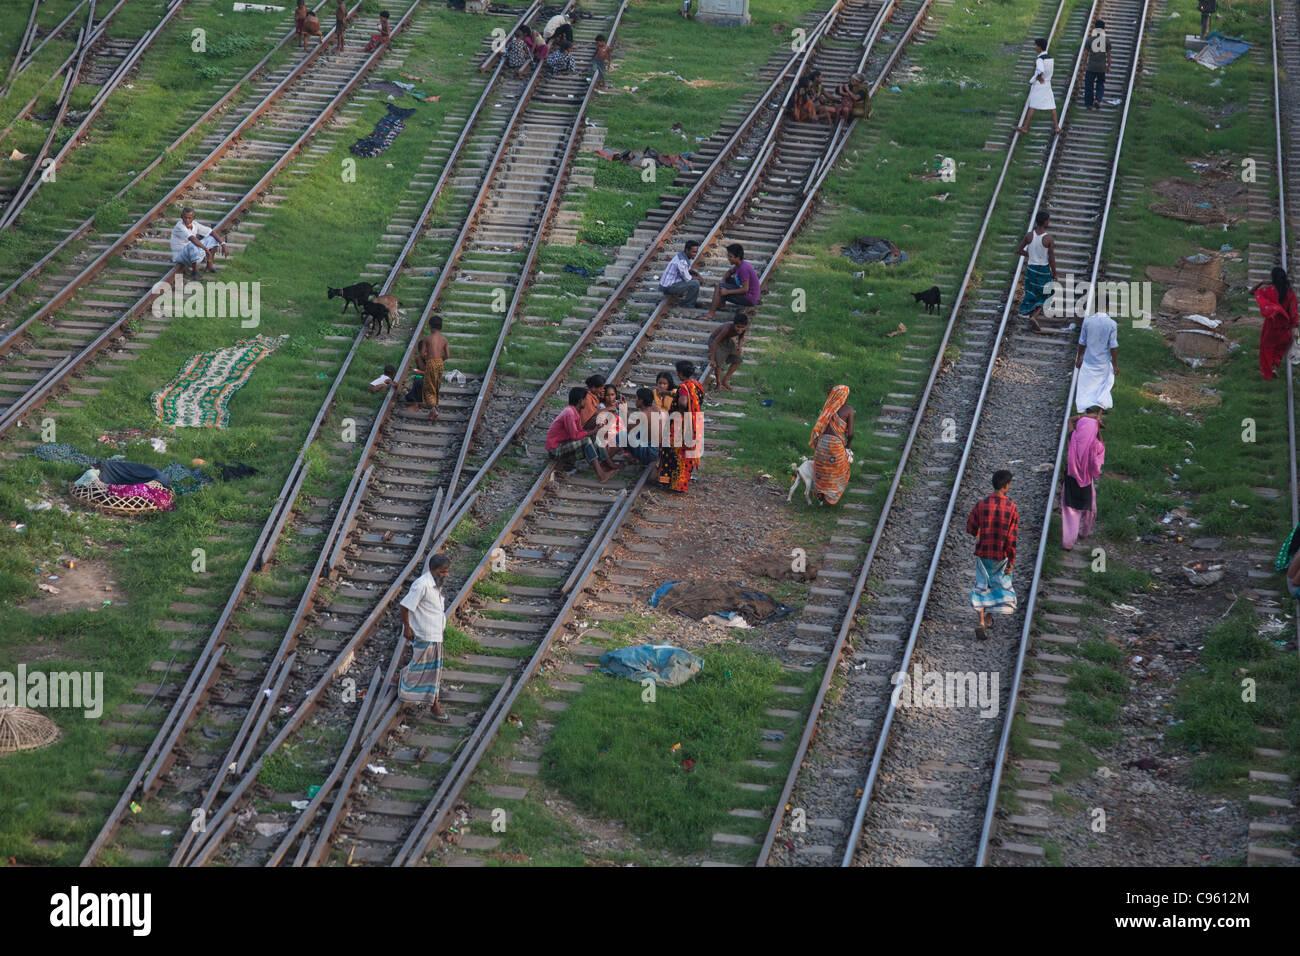 Life in Tejgaon slum in Dhaka  The slum is build along the train